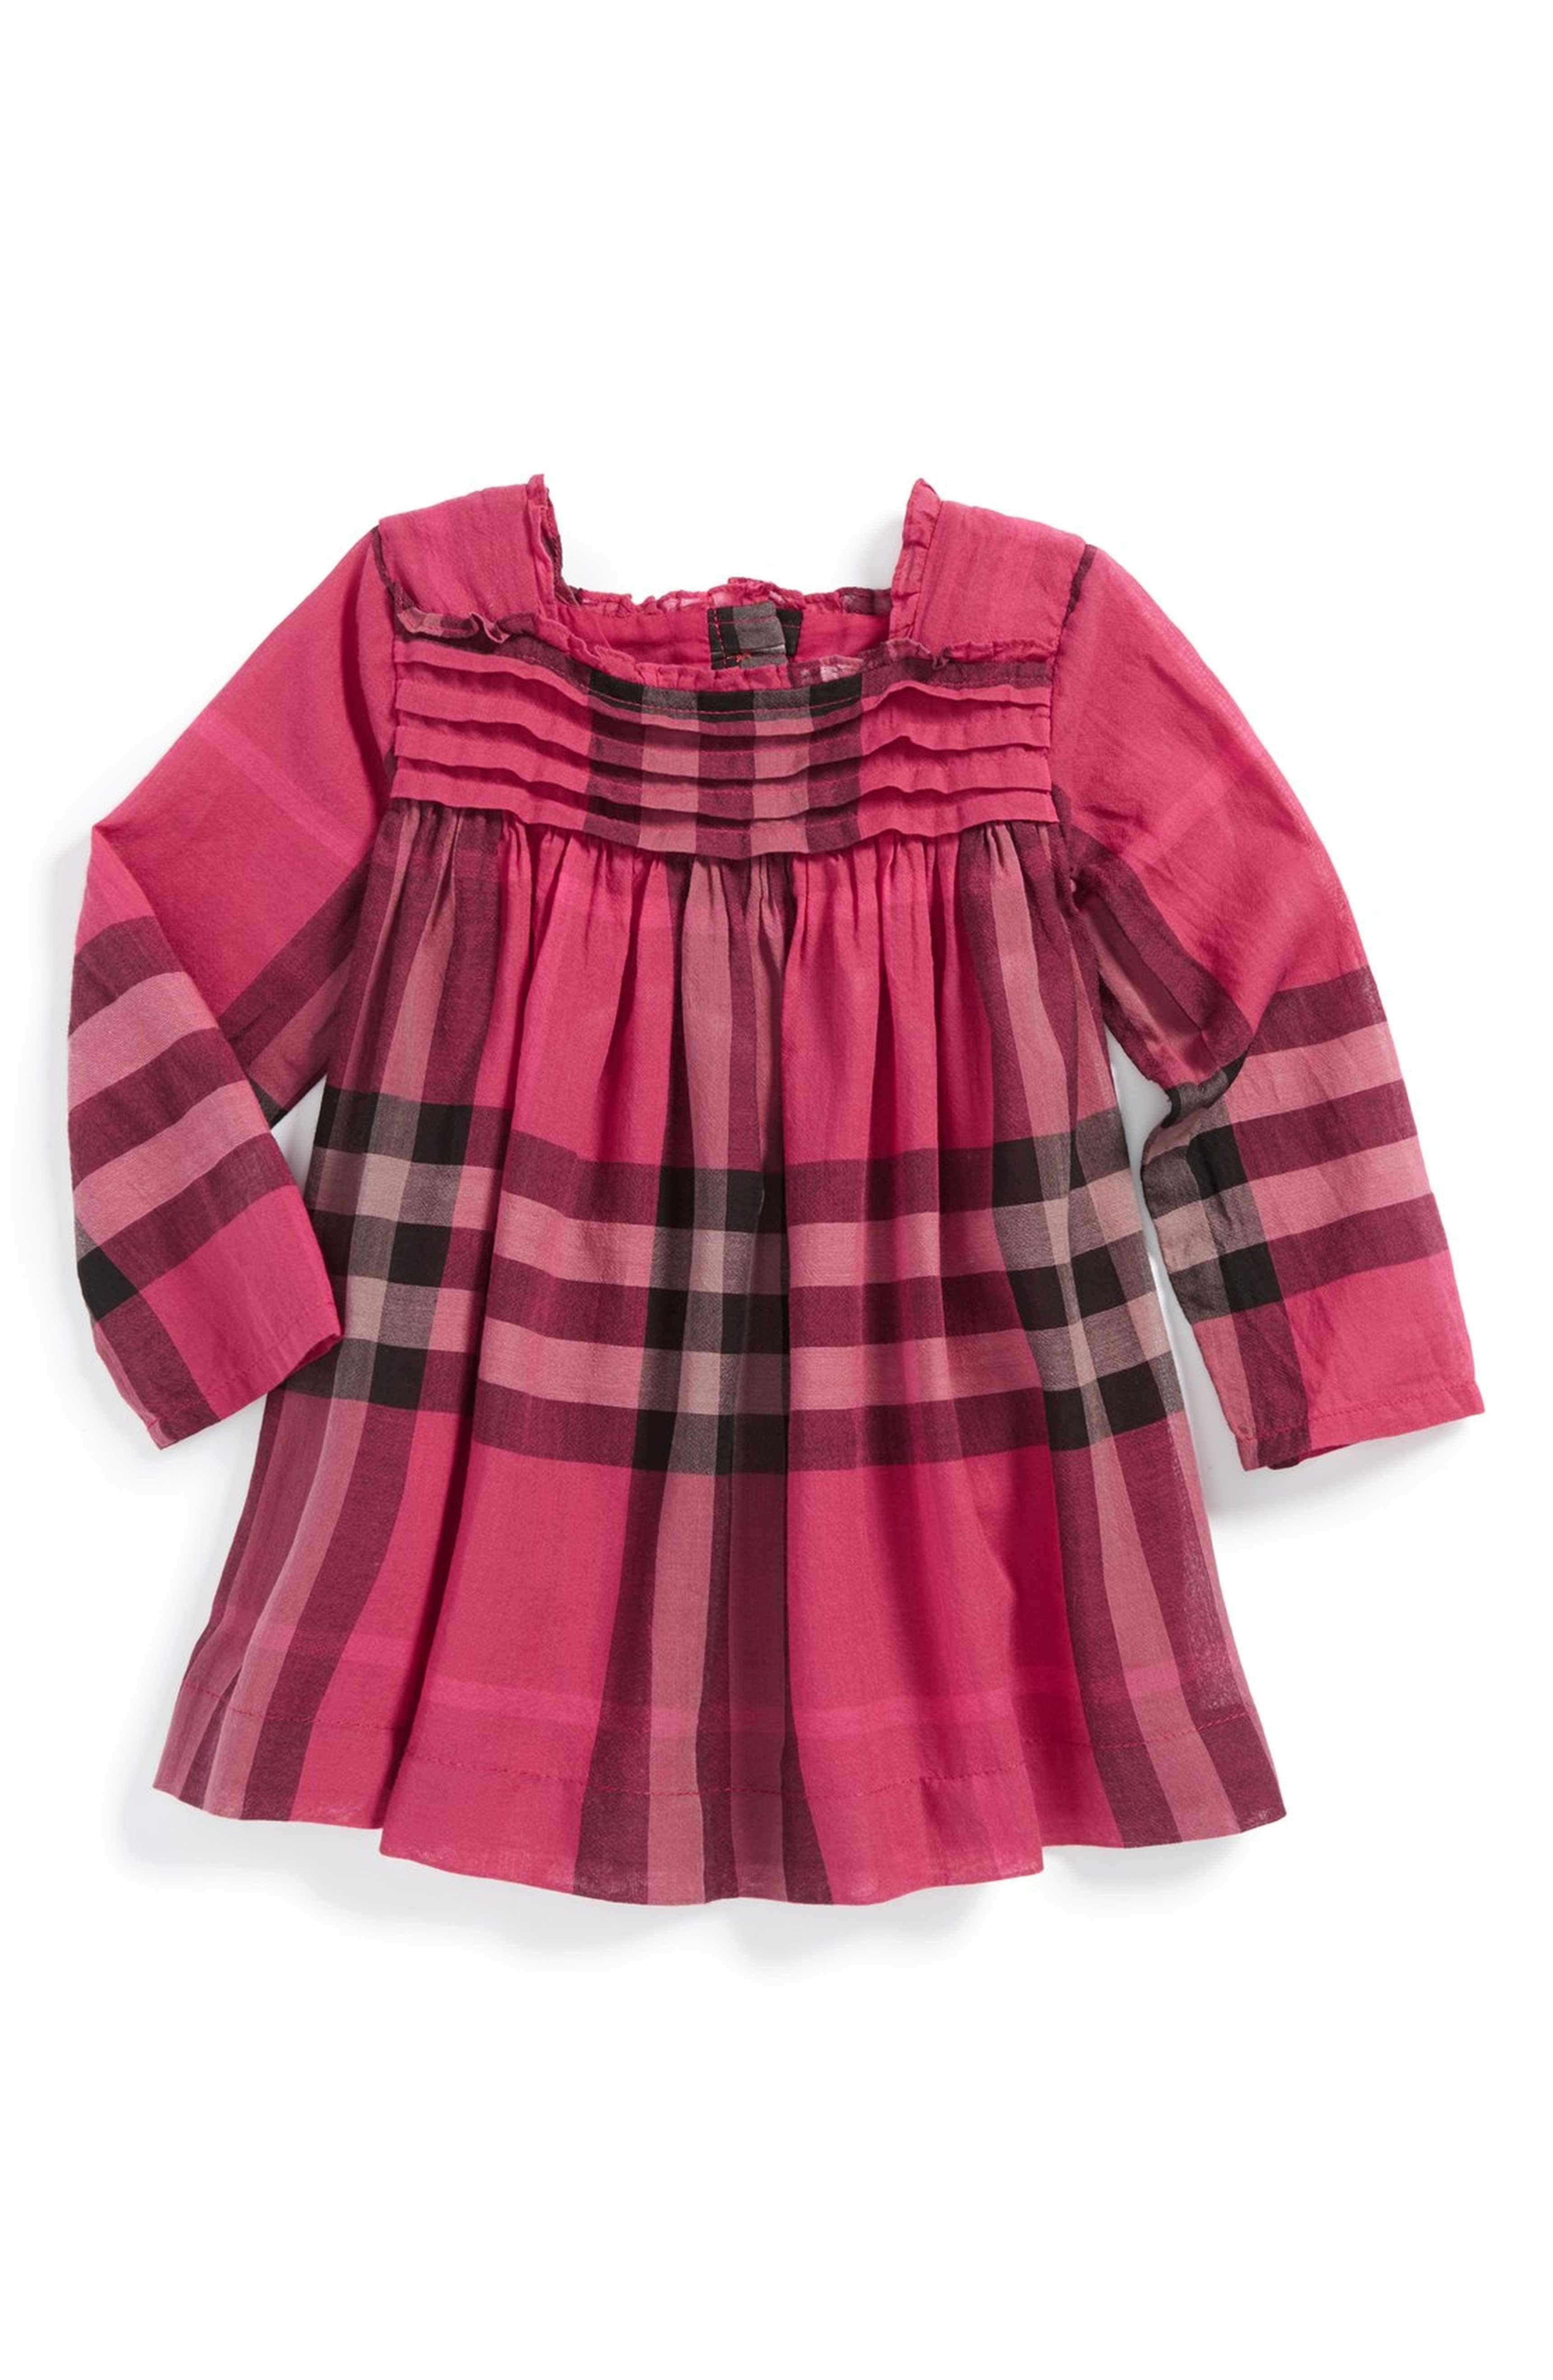 bcc347455 Main Image - Burberry 'Luna' Check Print Dress (Baby Girls) | ชุดลาย ...